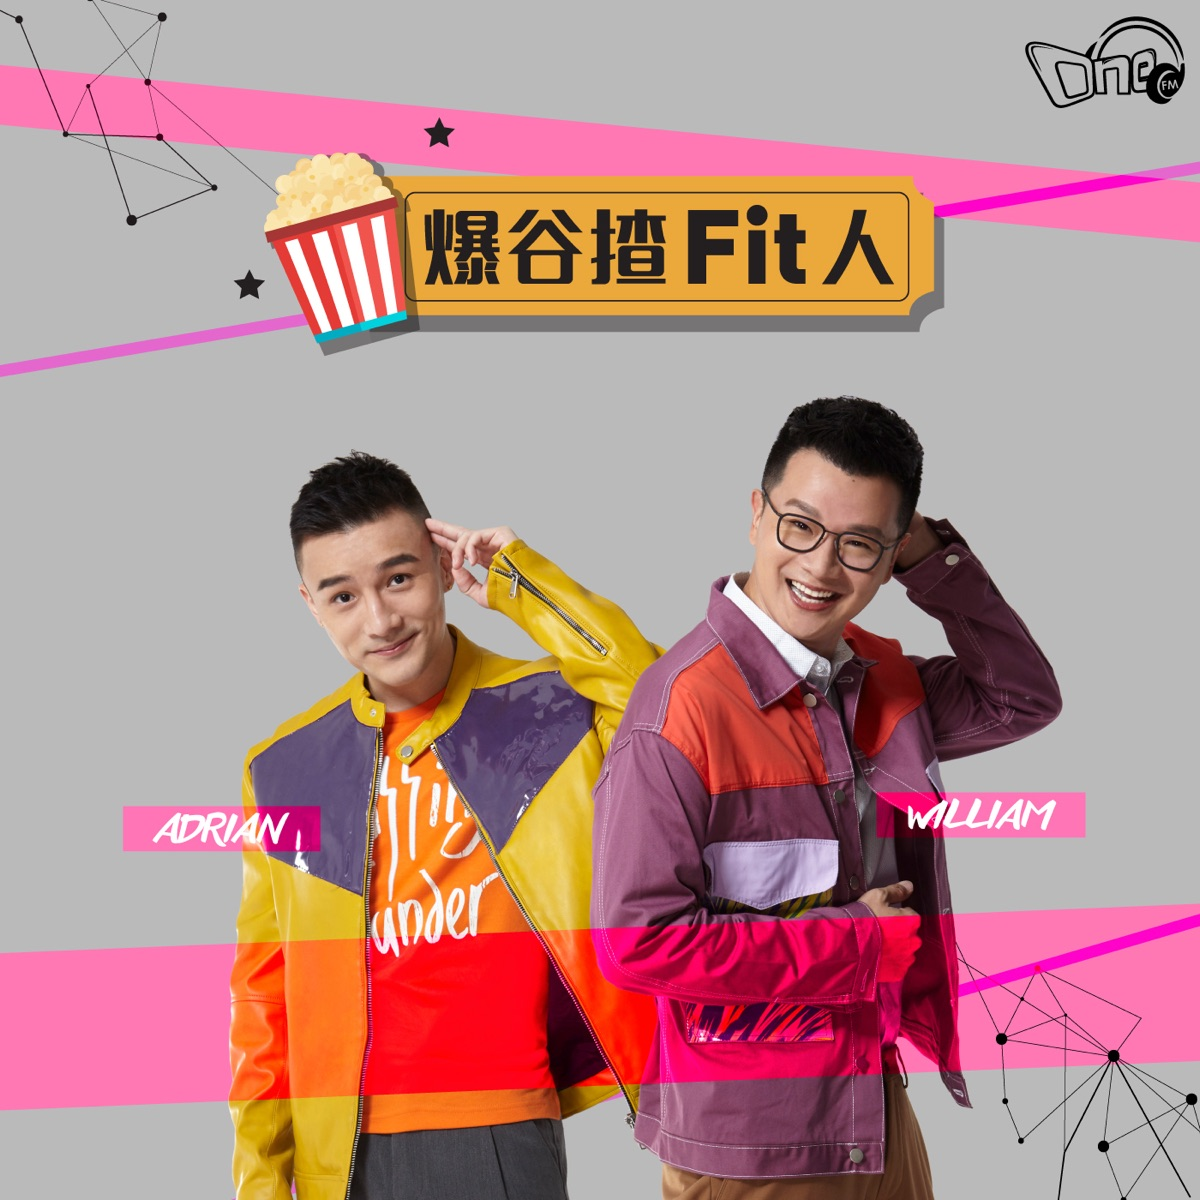 #HappyHour - 爆谷揸Fit人